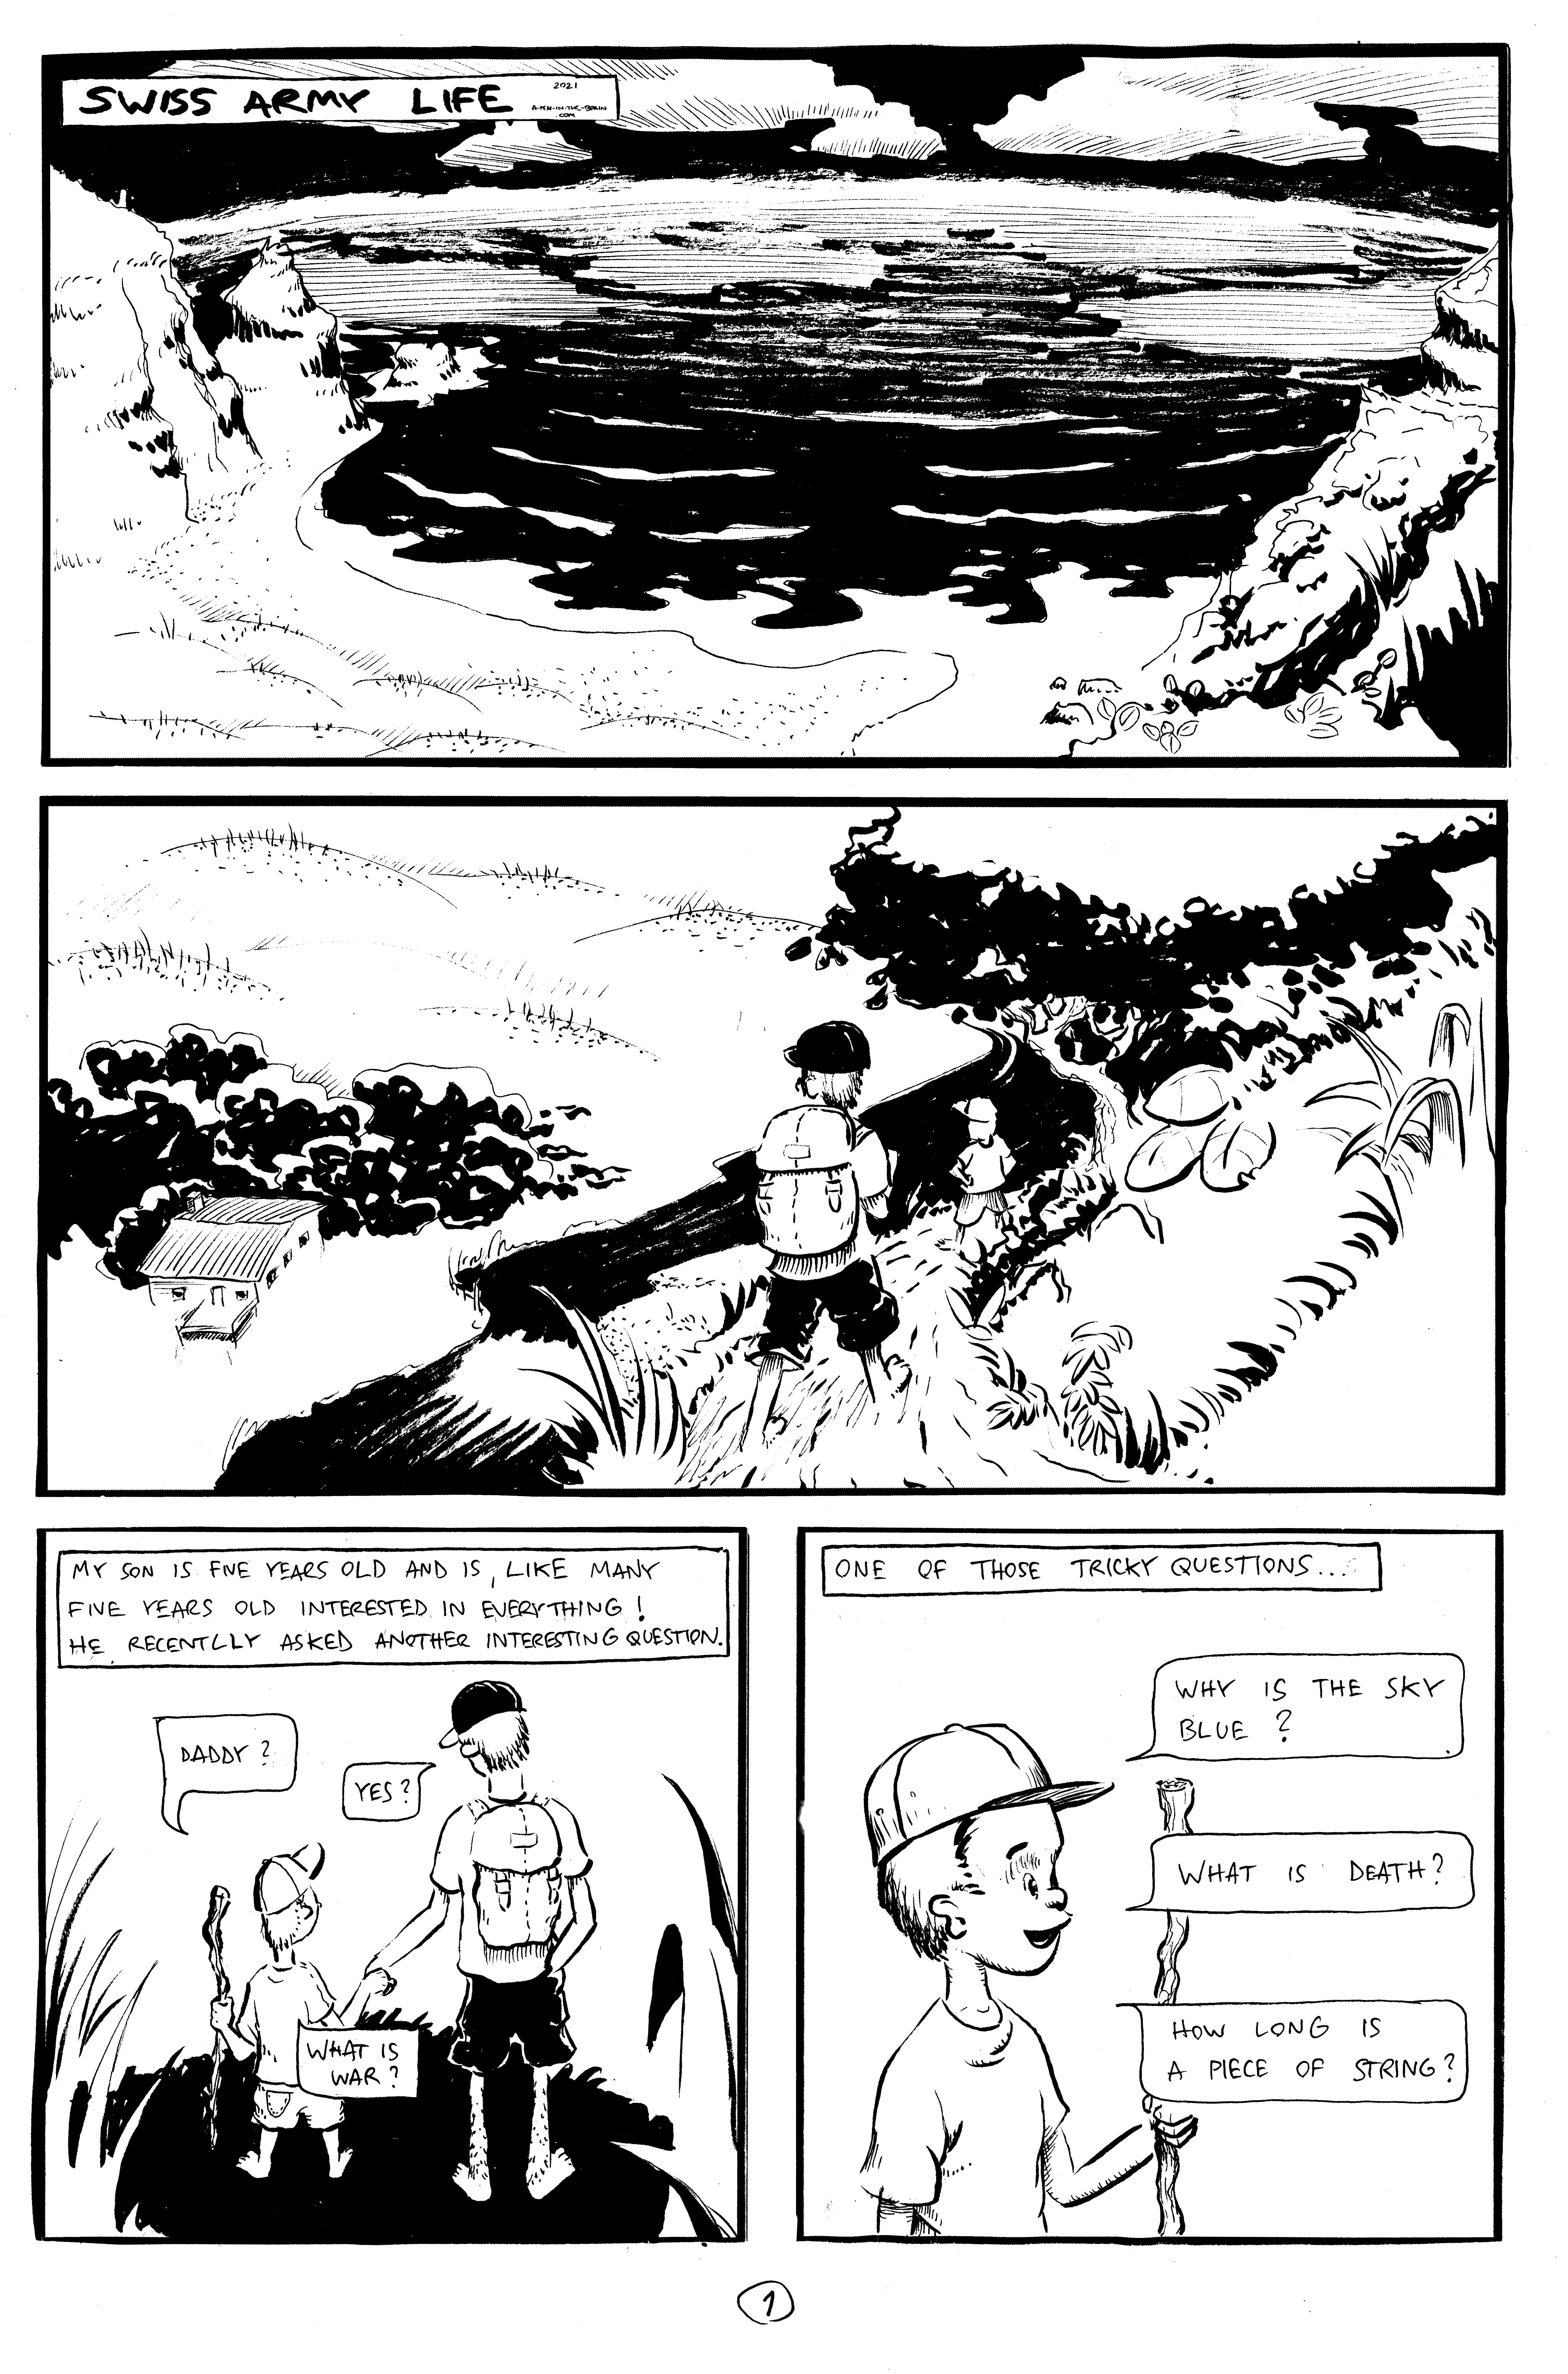 Swiss Army Life - Page 1